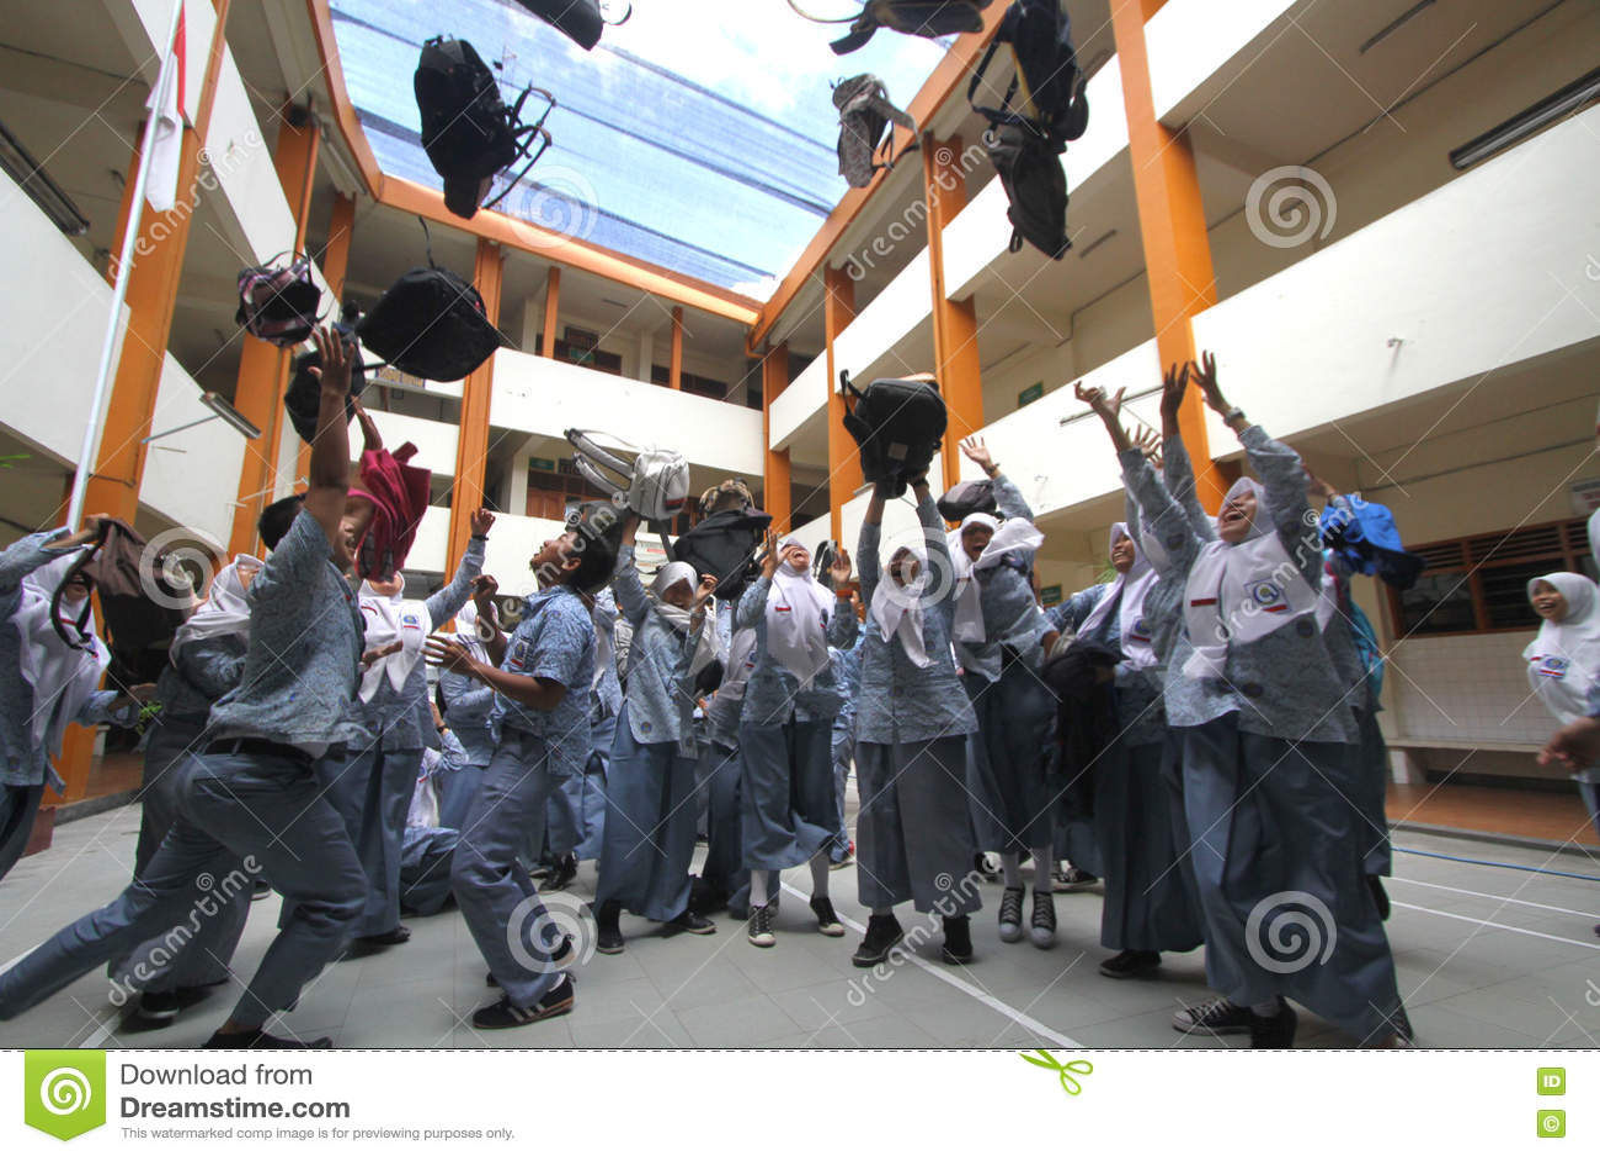 Excitement School Graduation Exam Editorial Photography - Image of